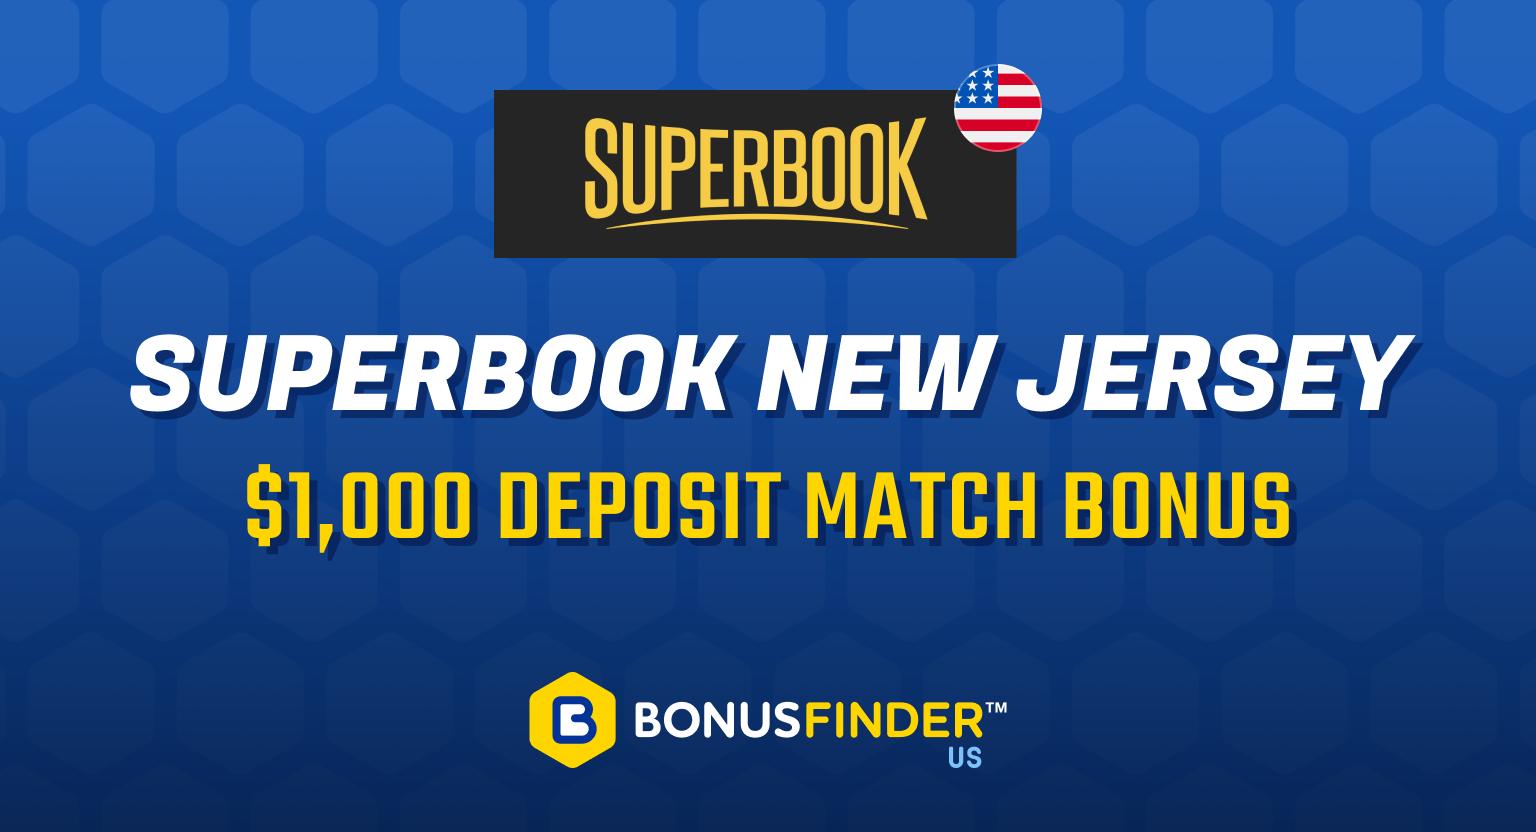 SuperBook New Jersey